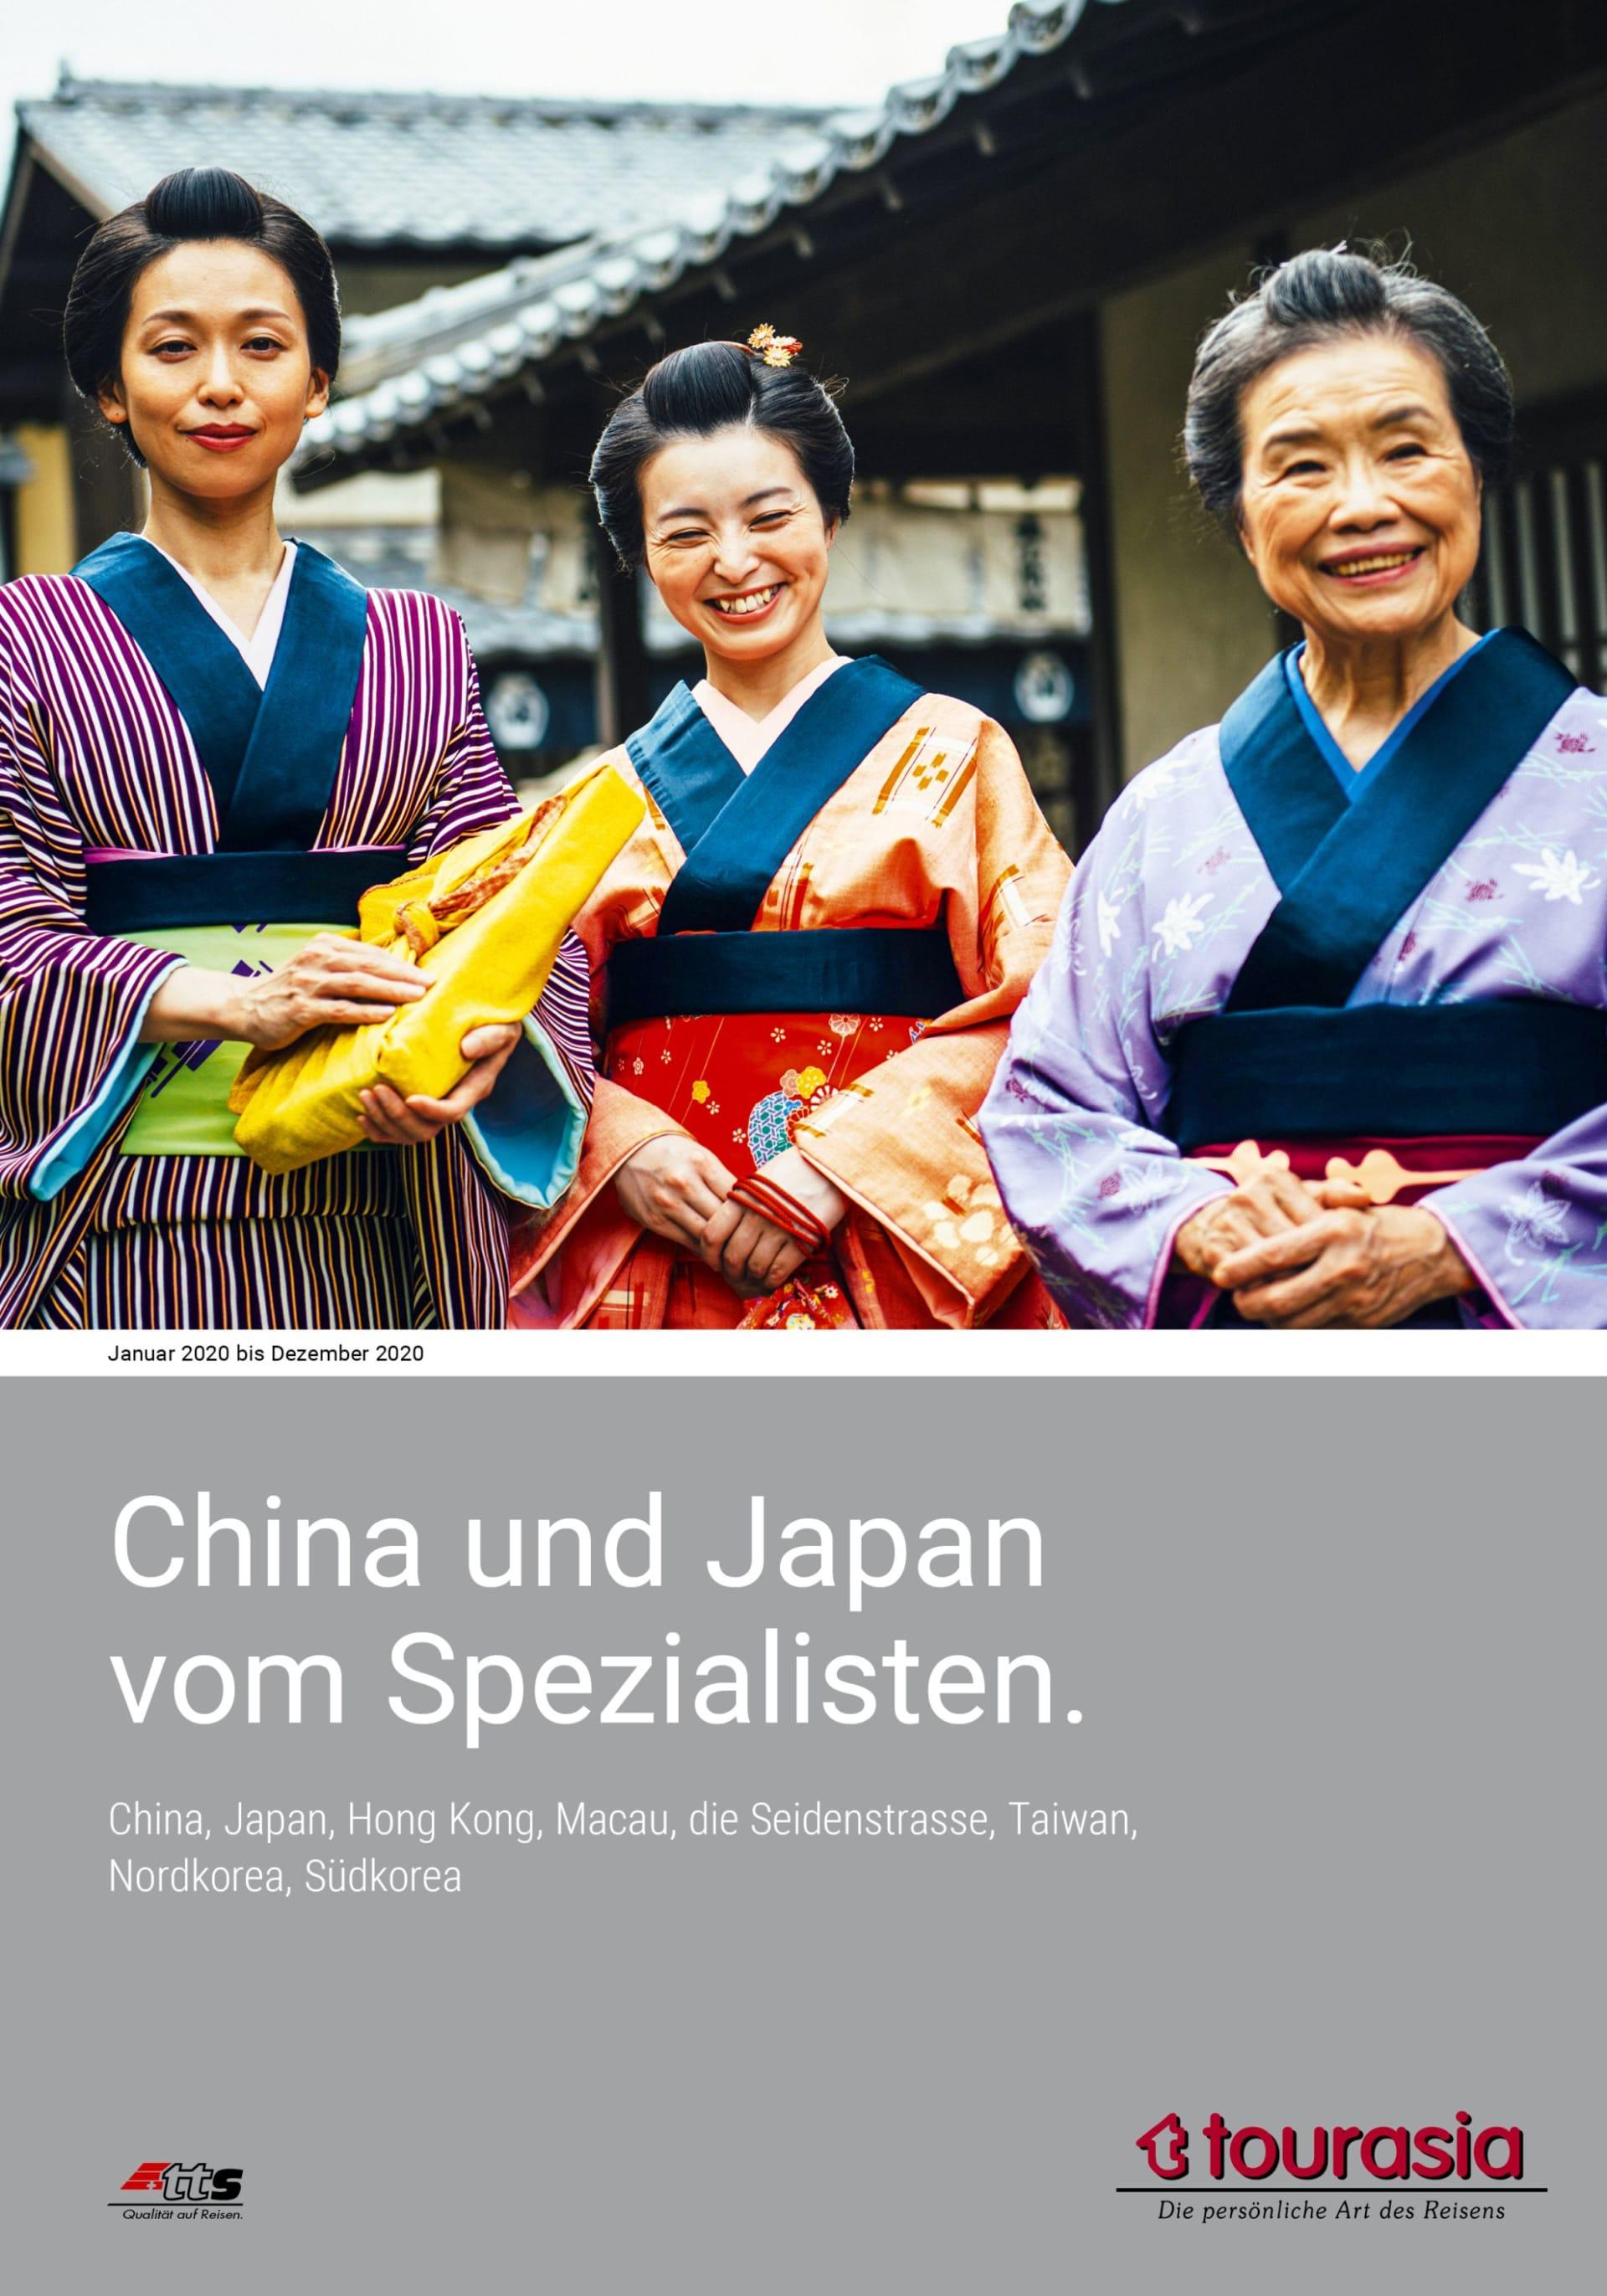 China und Japan: Januar 2020 - Dezember 2020